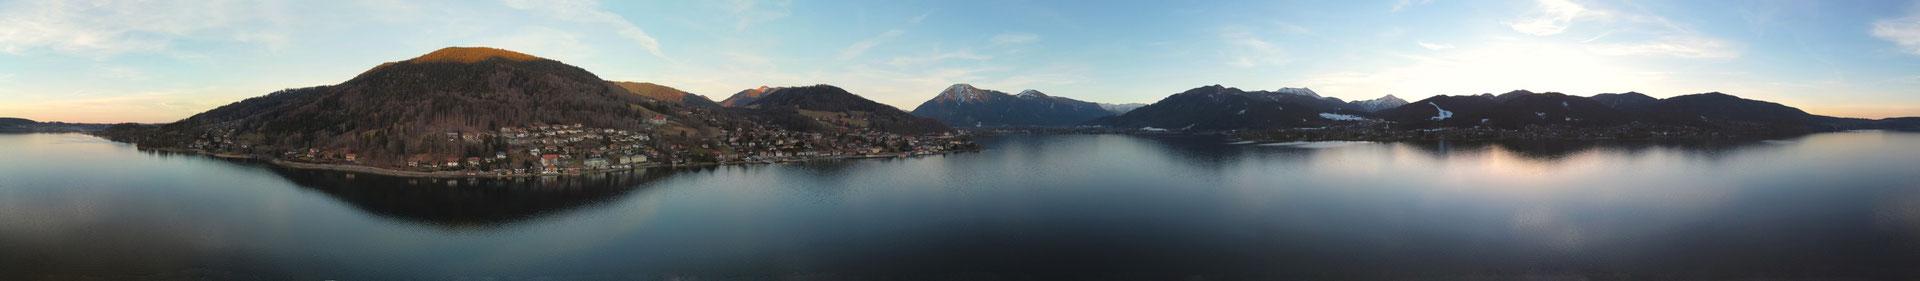 Panorama - Drohnenfoto - Landschaft - Winter -Sonnenuntergang - Tegernsee - 360 Grad